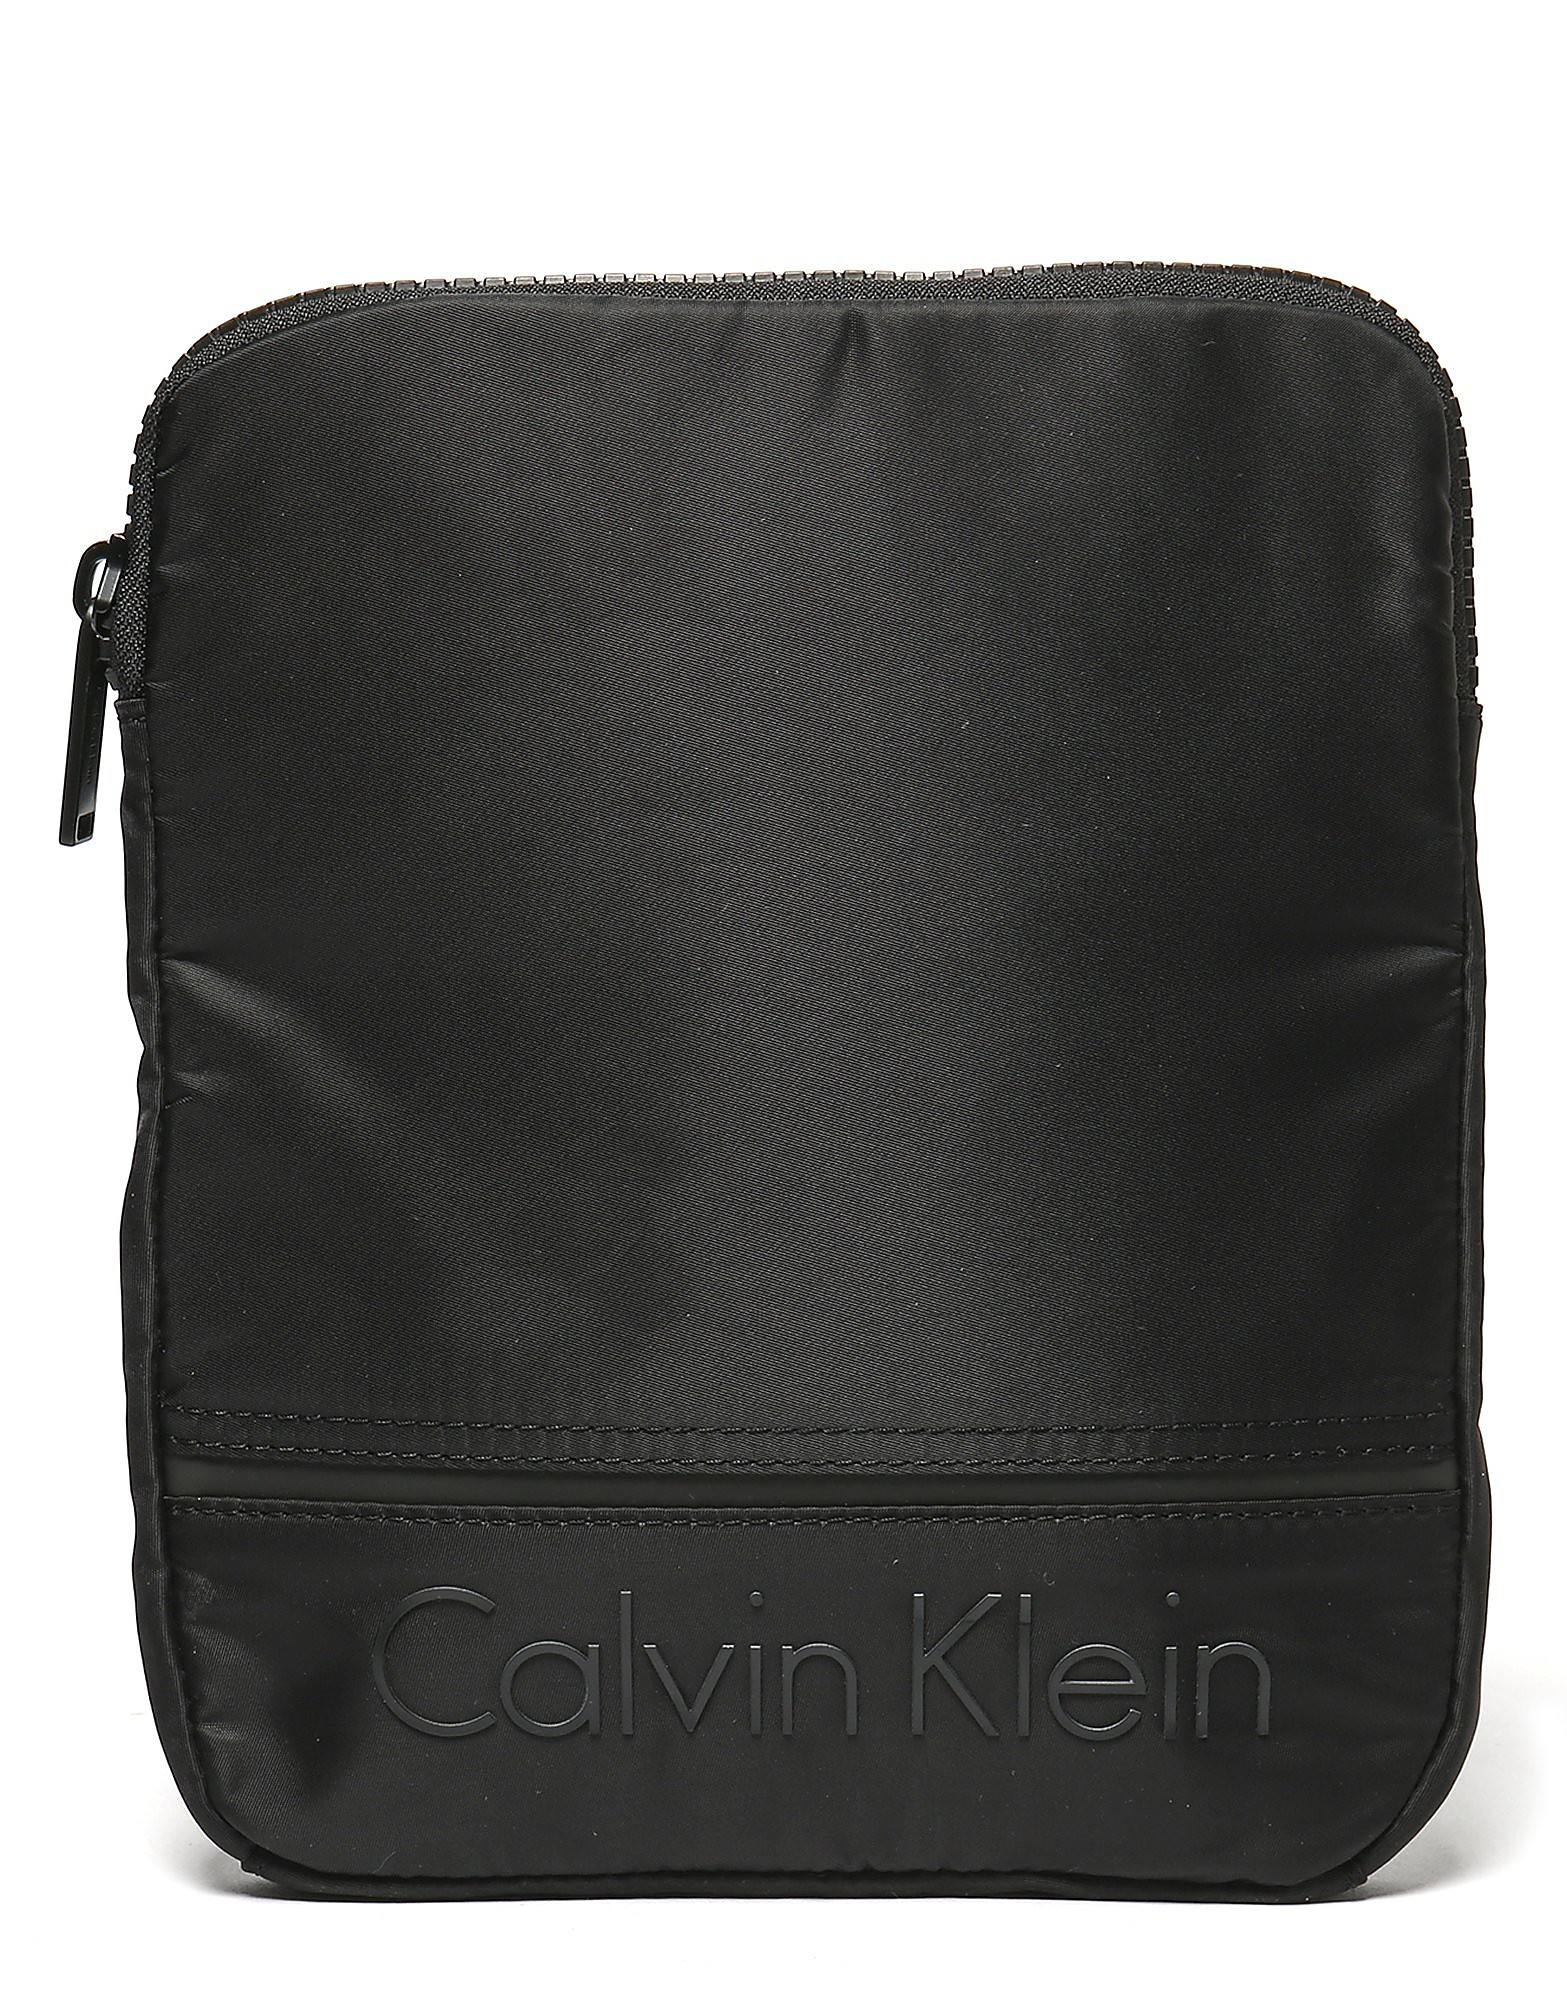 Calvin Klein Matthew Flat Crossover Bag